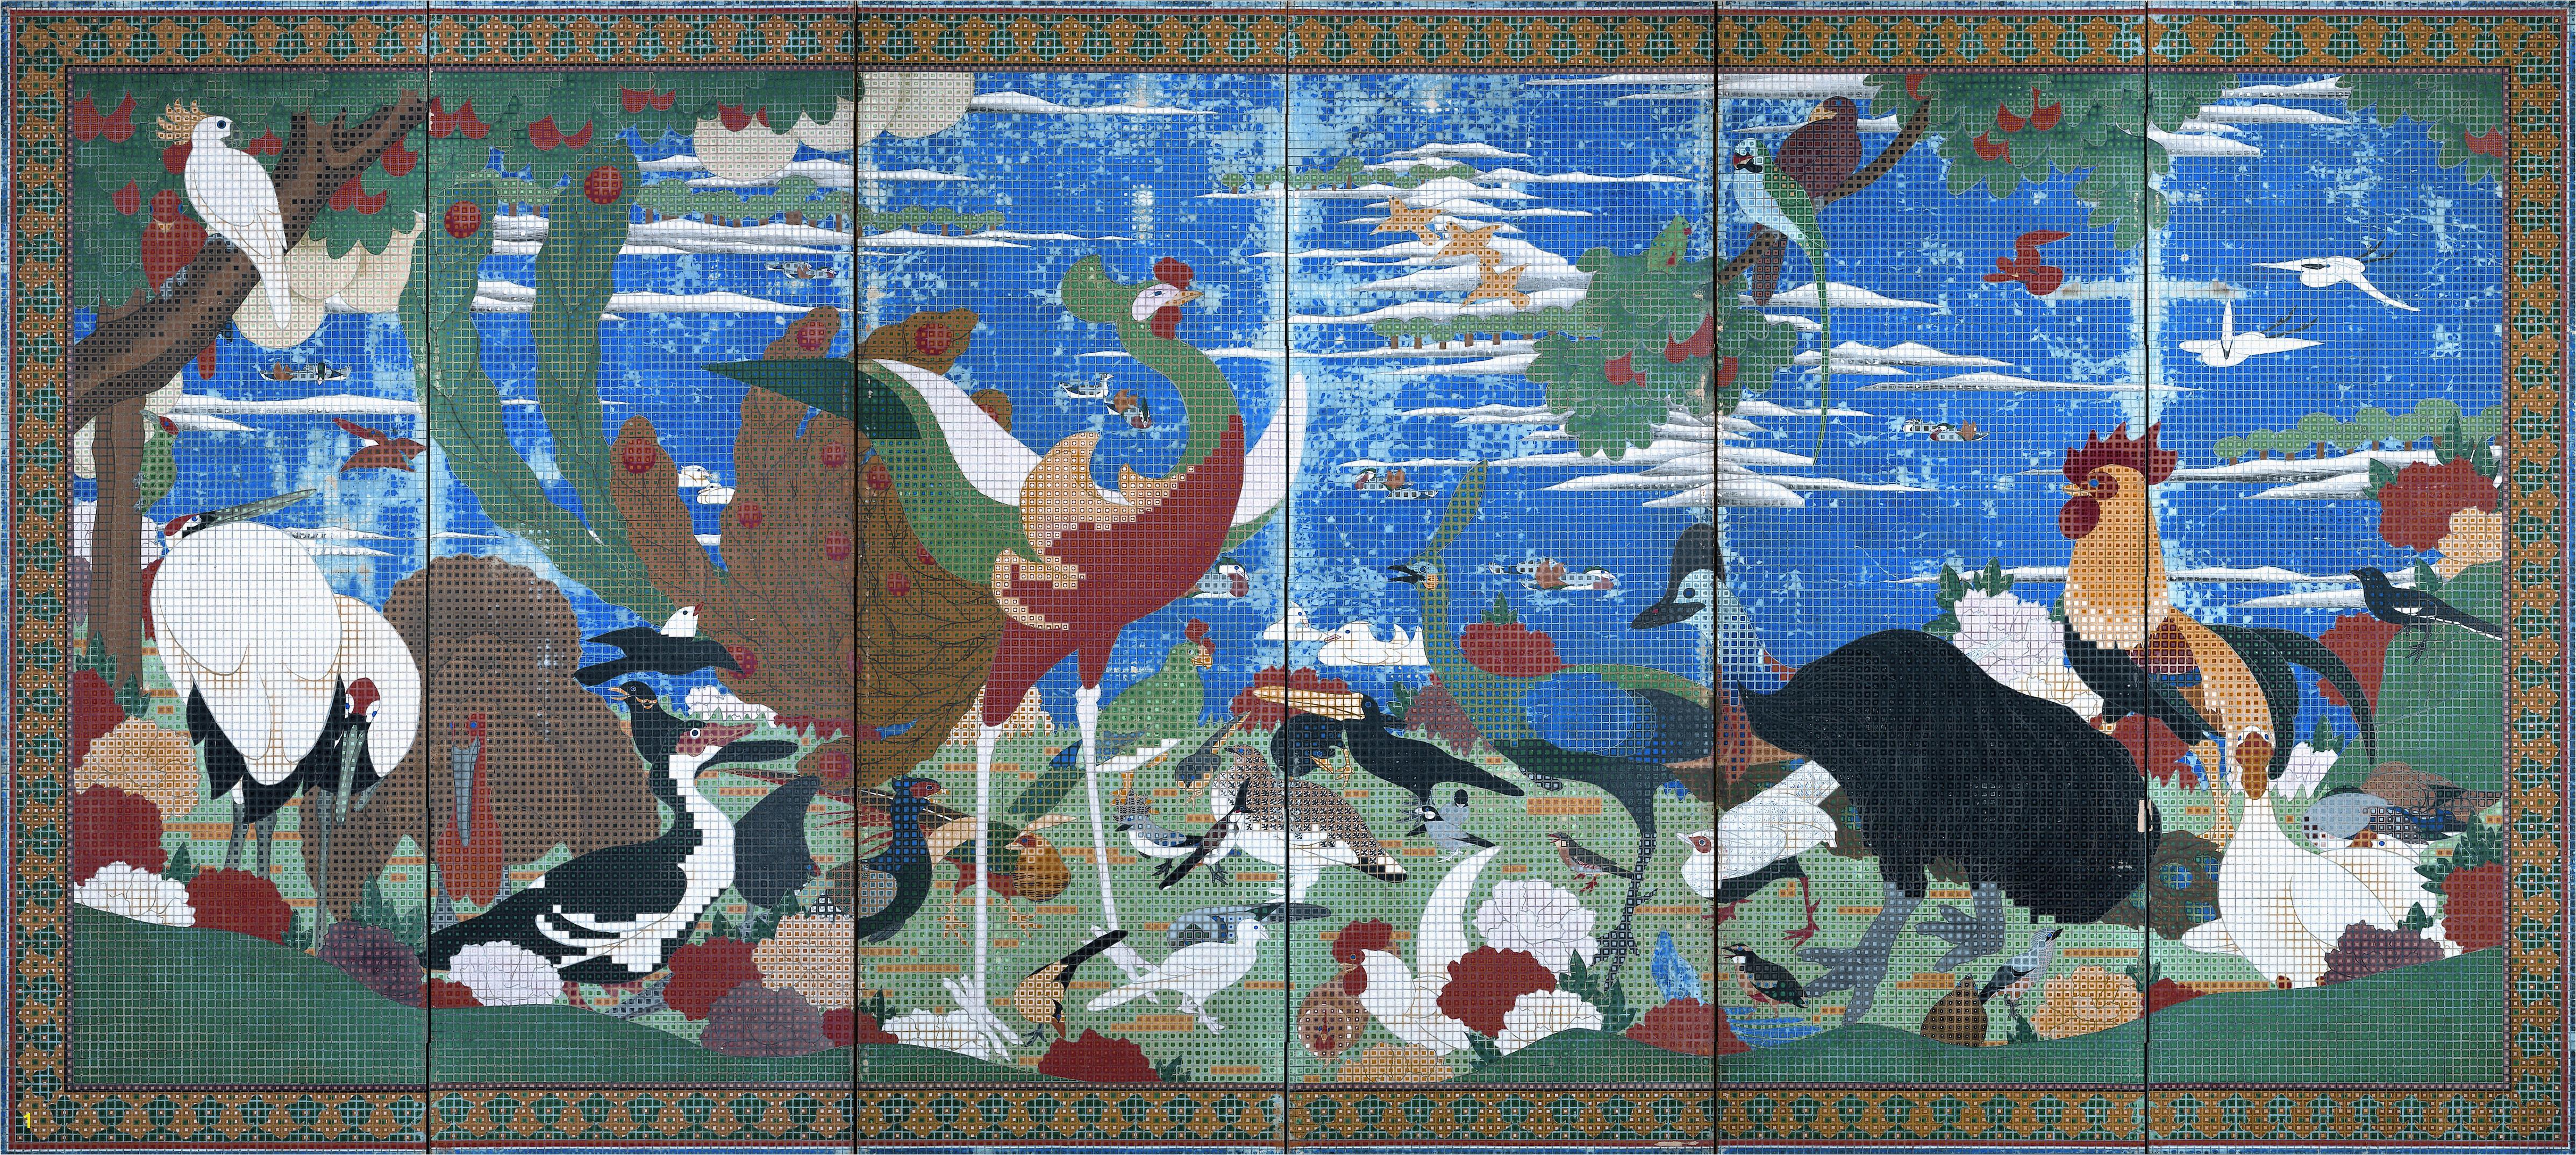 How to Make An Outdoor Mosaic Mural How An American Collector Brought Jakuchu to tohoku